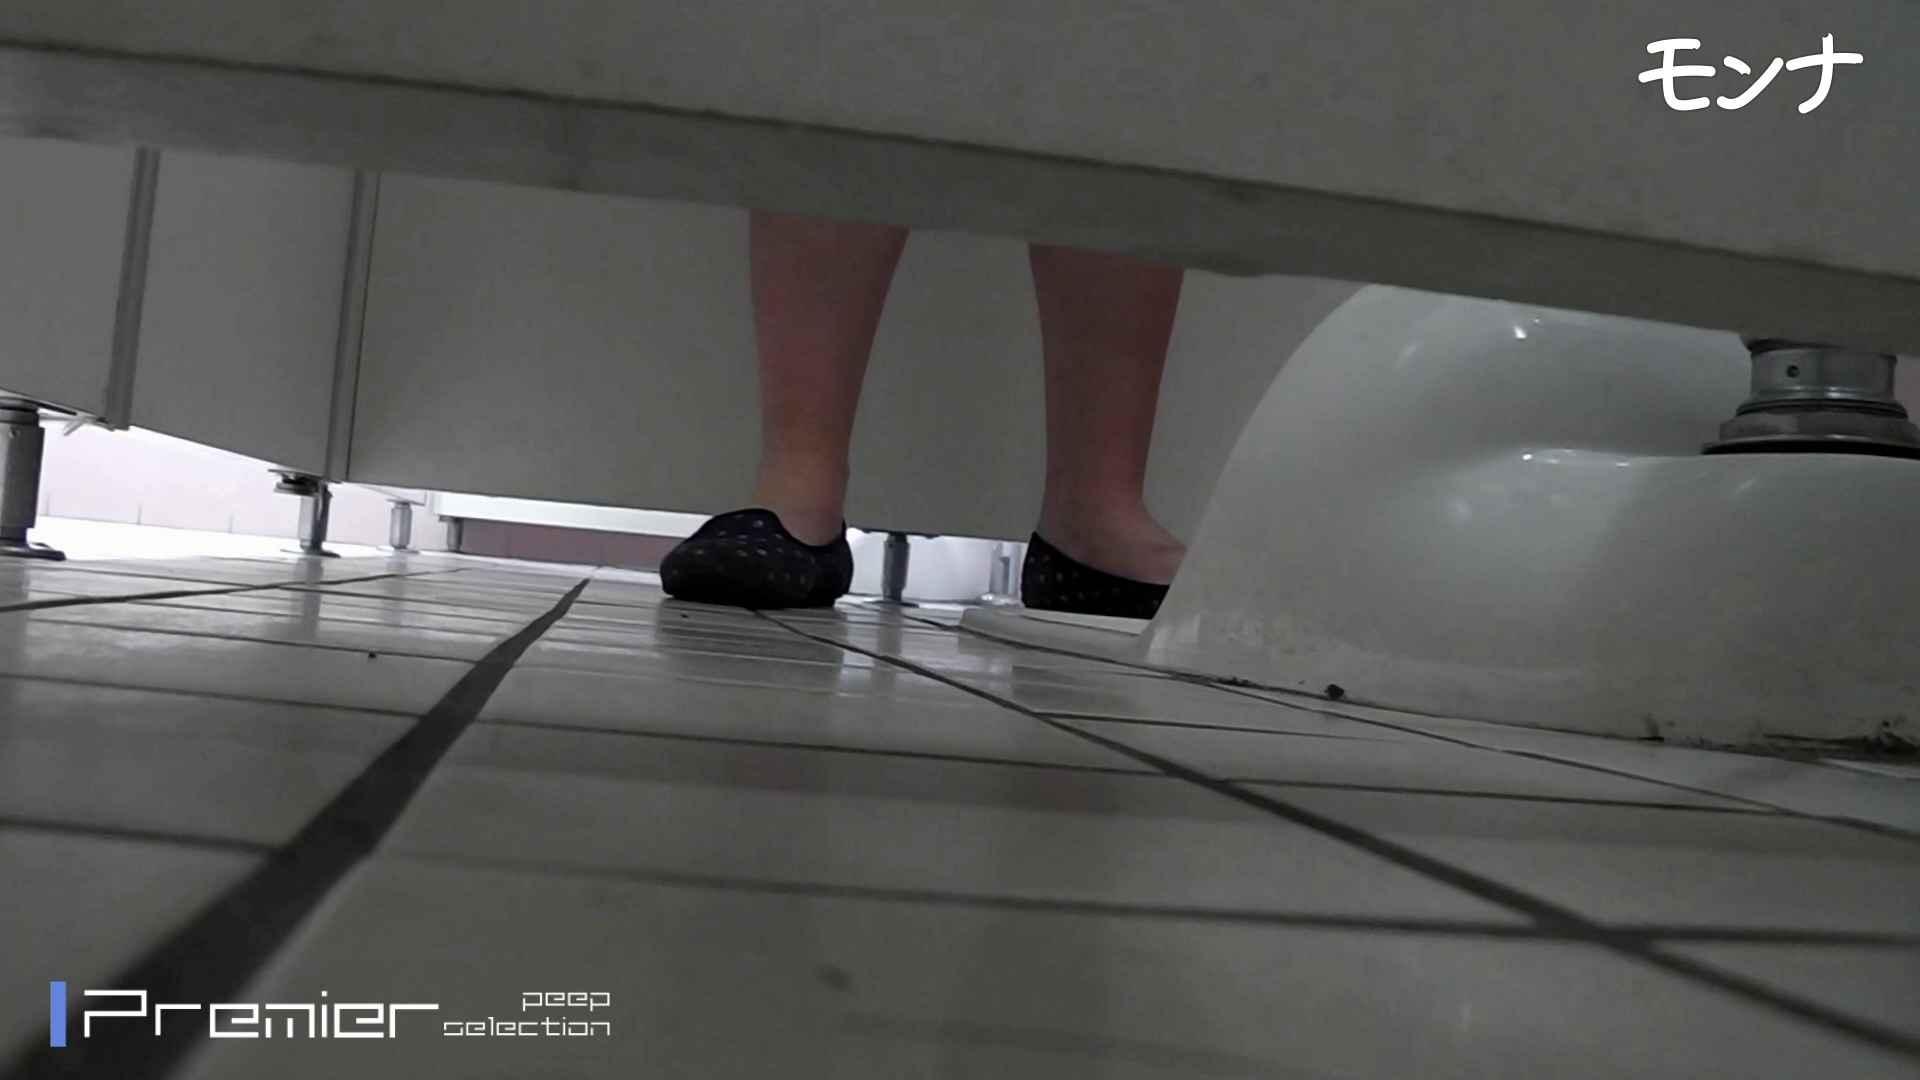 CM 悶絶シリーズ5 【美しい日本の未来 No.128】 細身体型 AV動画キャプチャ 111枚 46